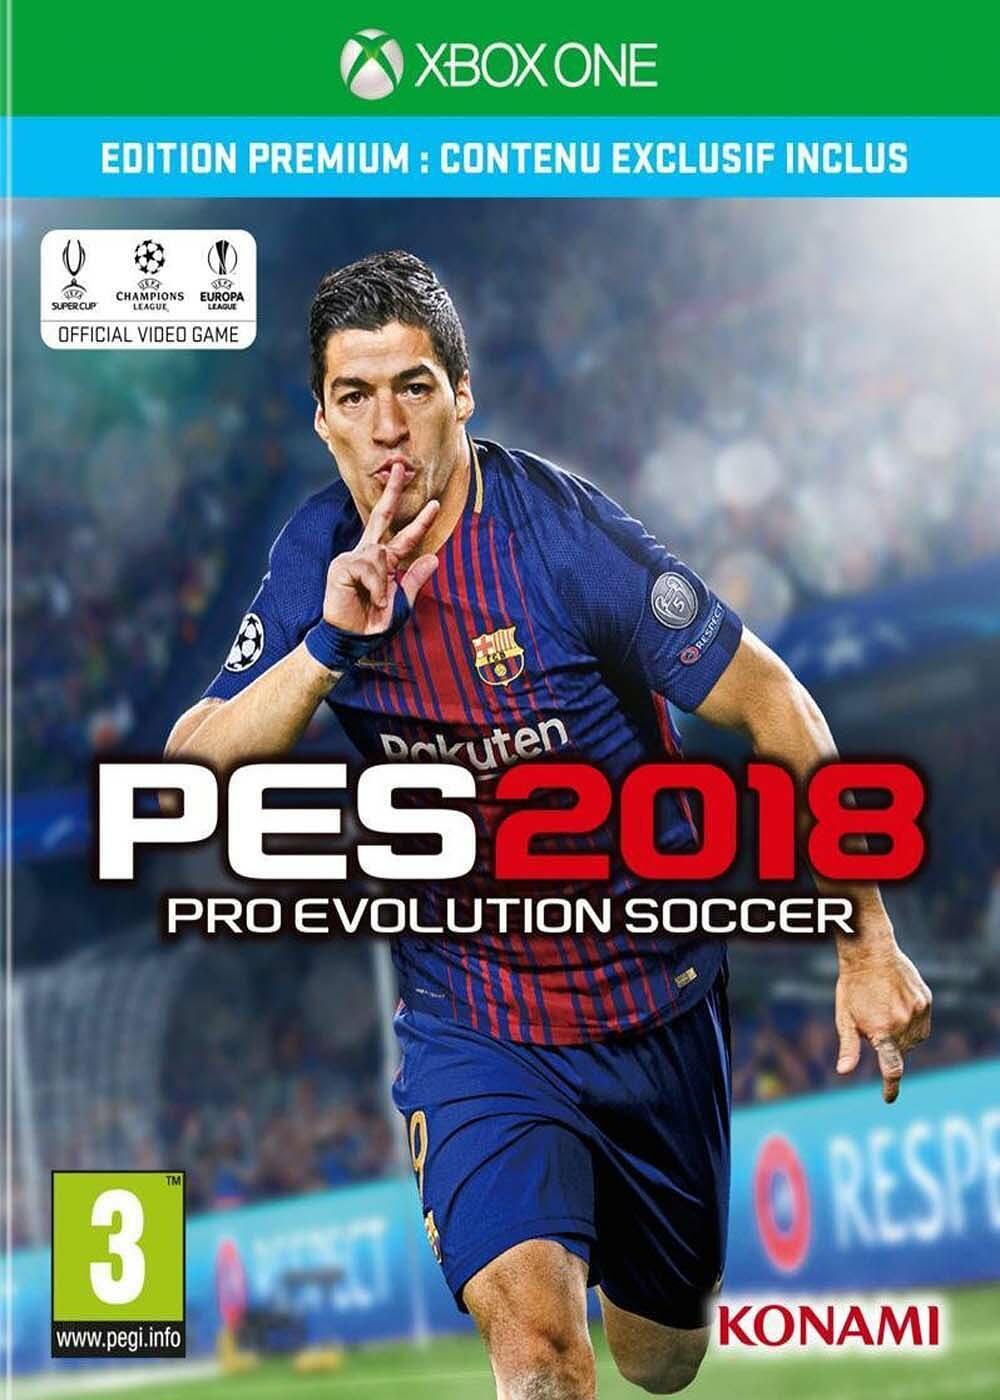 Pro Evolution Soccer 2018 |